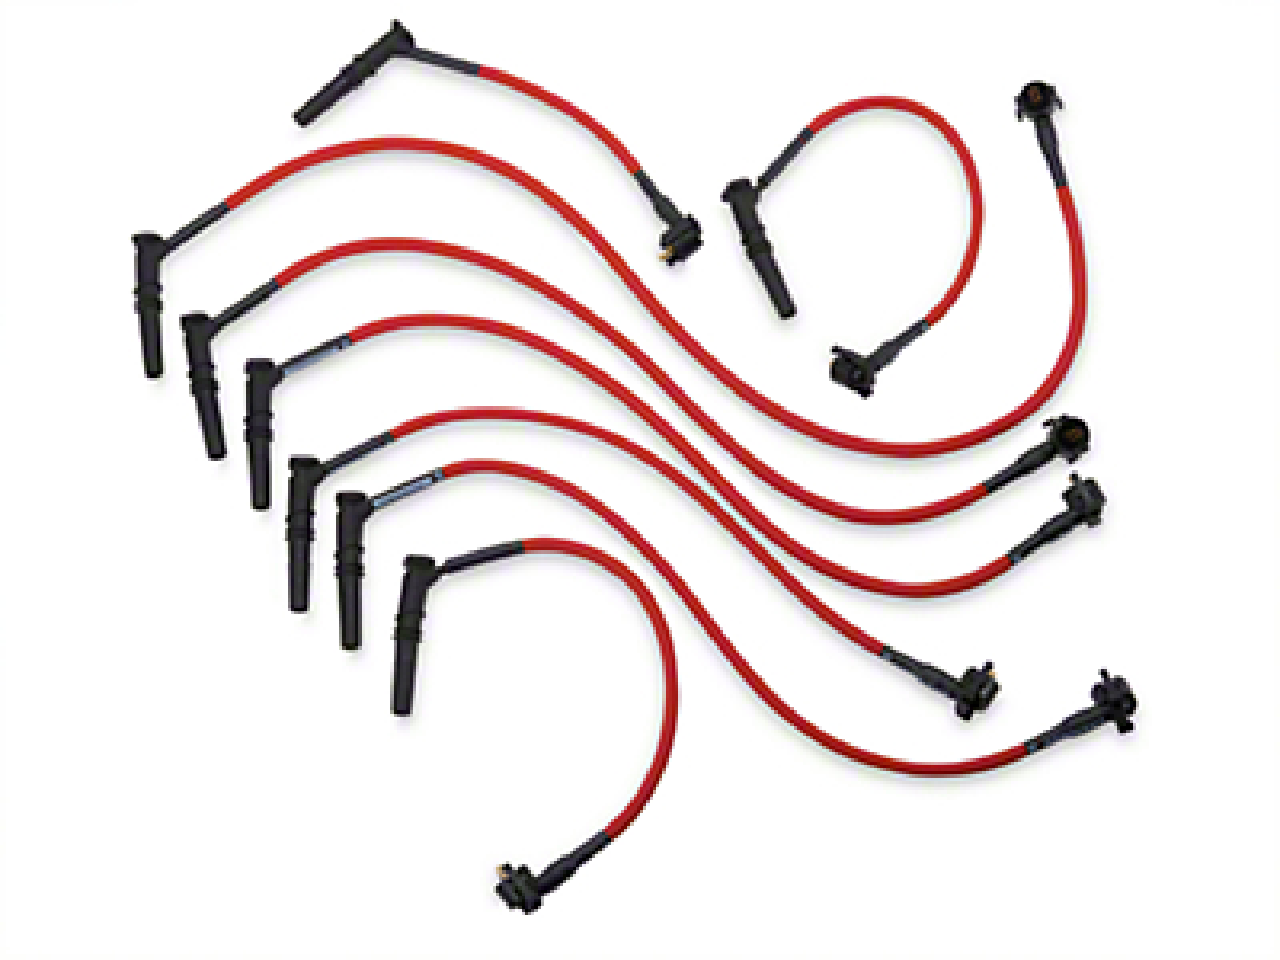 Performance Distributors Livewires 10mm Spark Plug Wires - Red (96-98 GT)